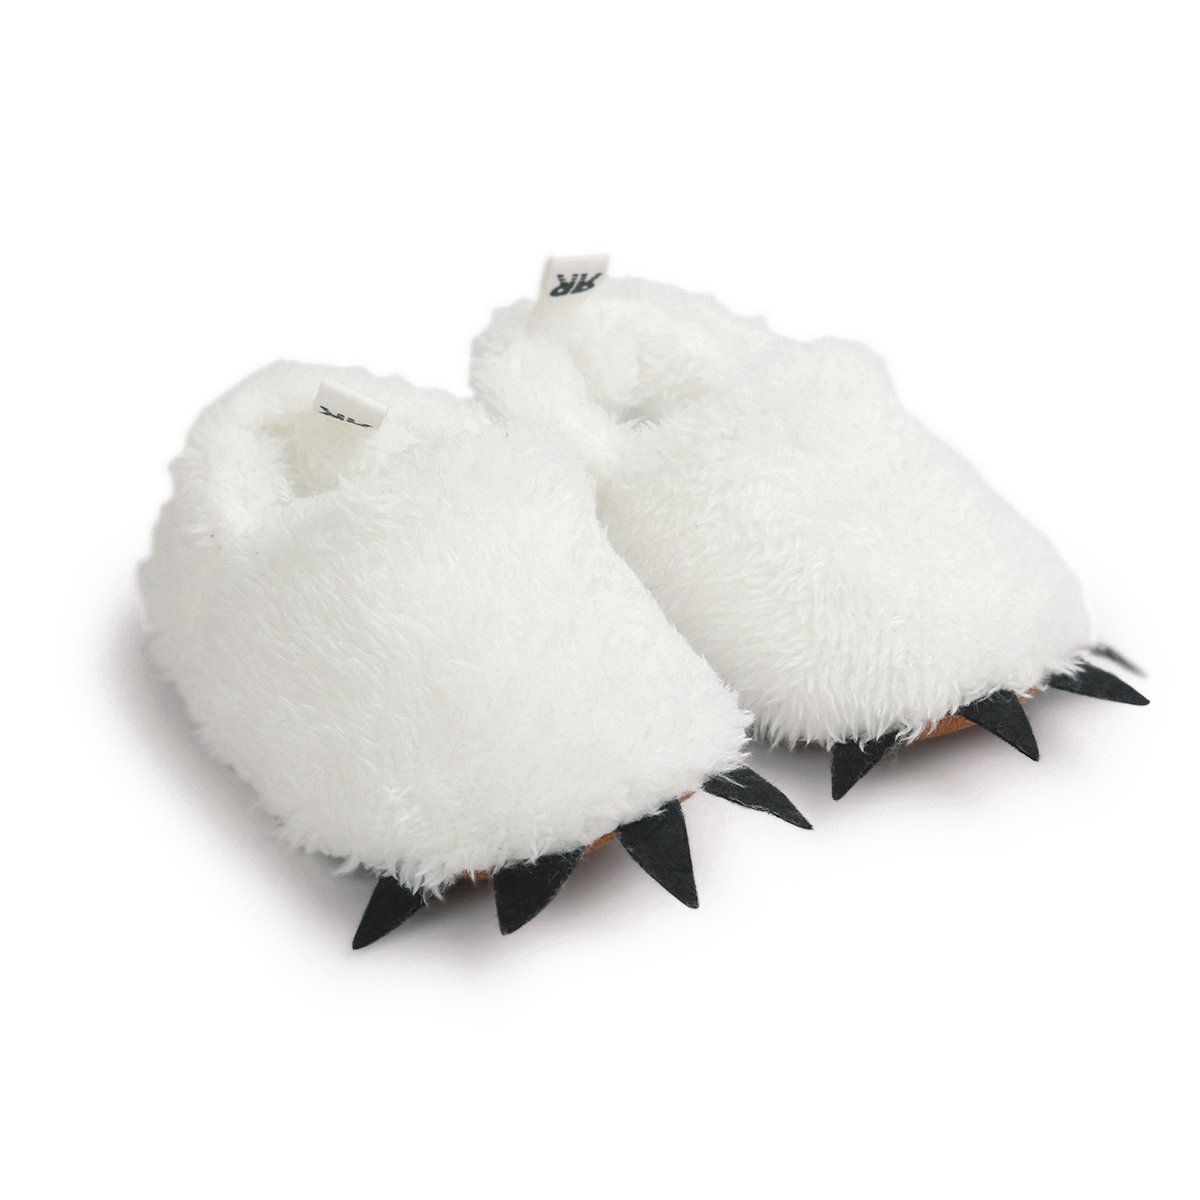 Vanbuy Baby Boys Girls Shoes Bear Paw Animal Slippers Boots Newborn Infant Crib Shoes WB28-White-L by Vanbuy (Image #4)